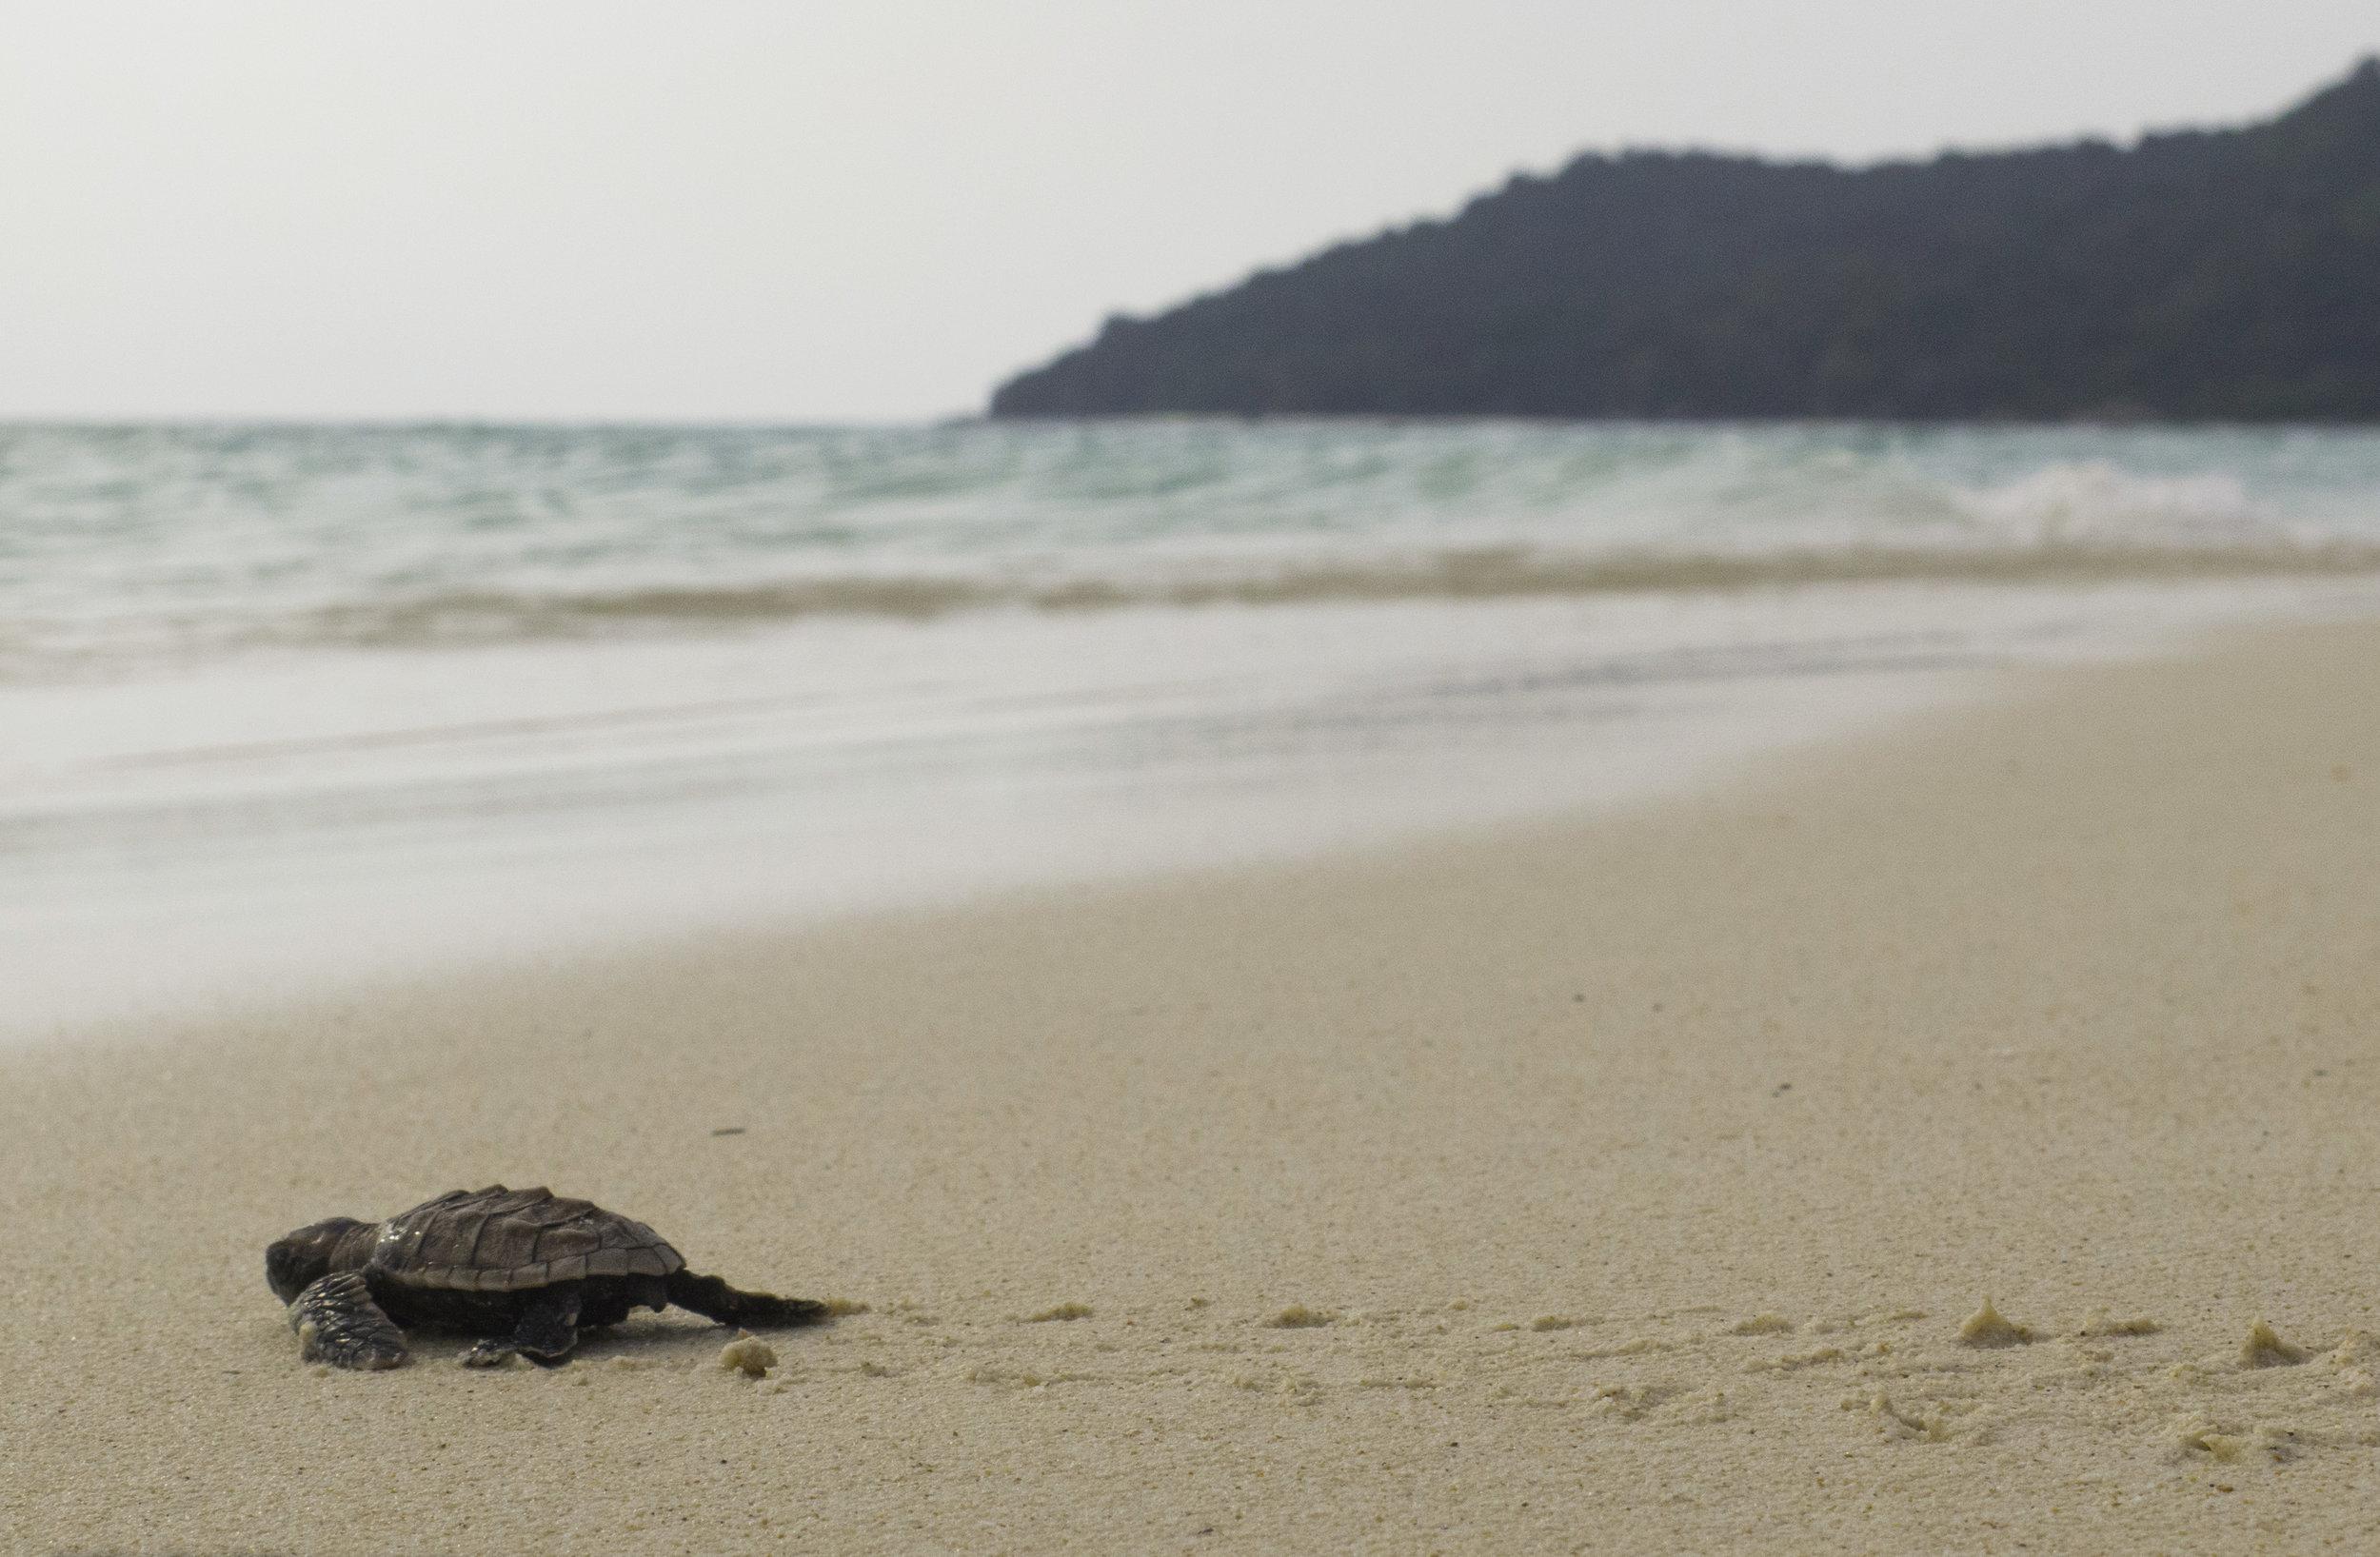 Island back ground single turtle.jpg